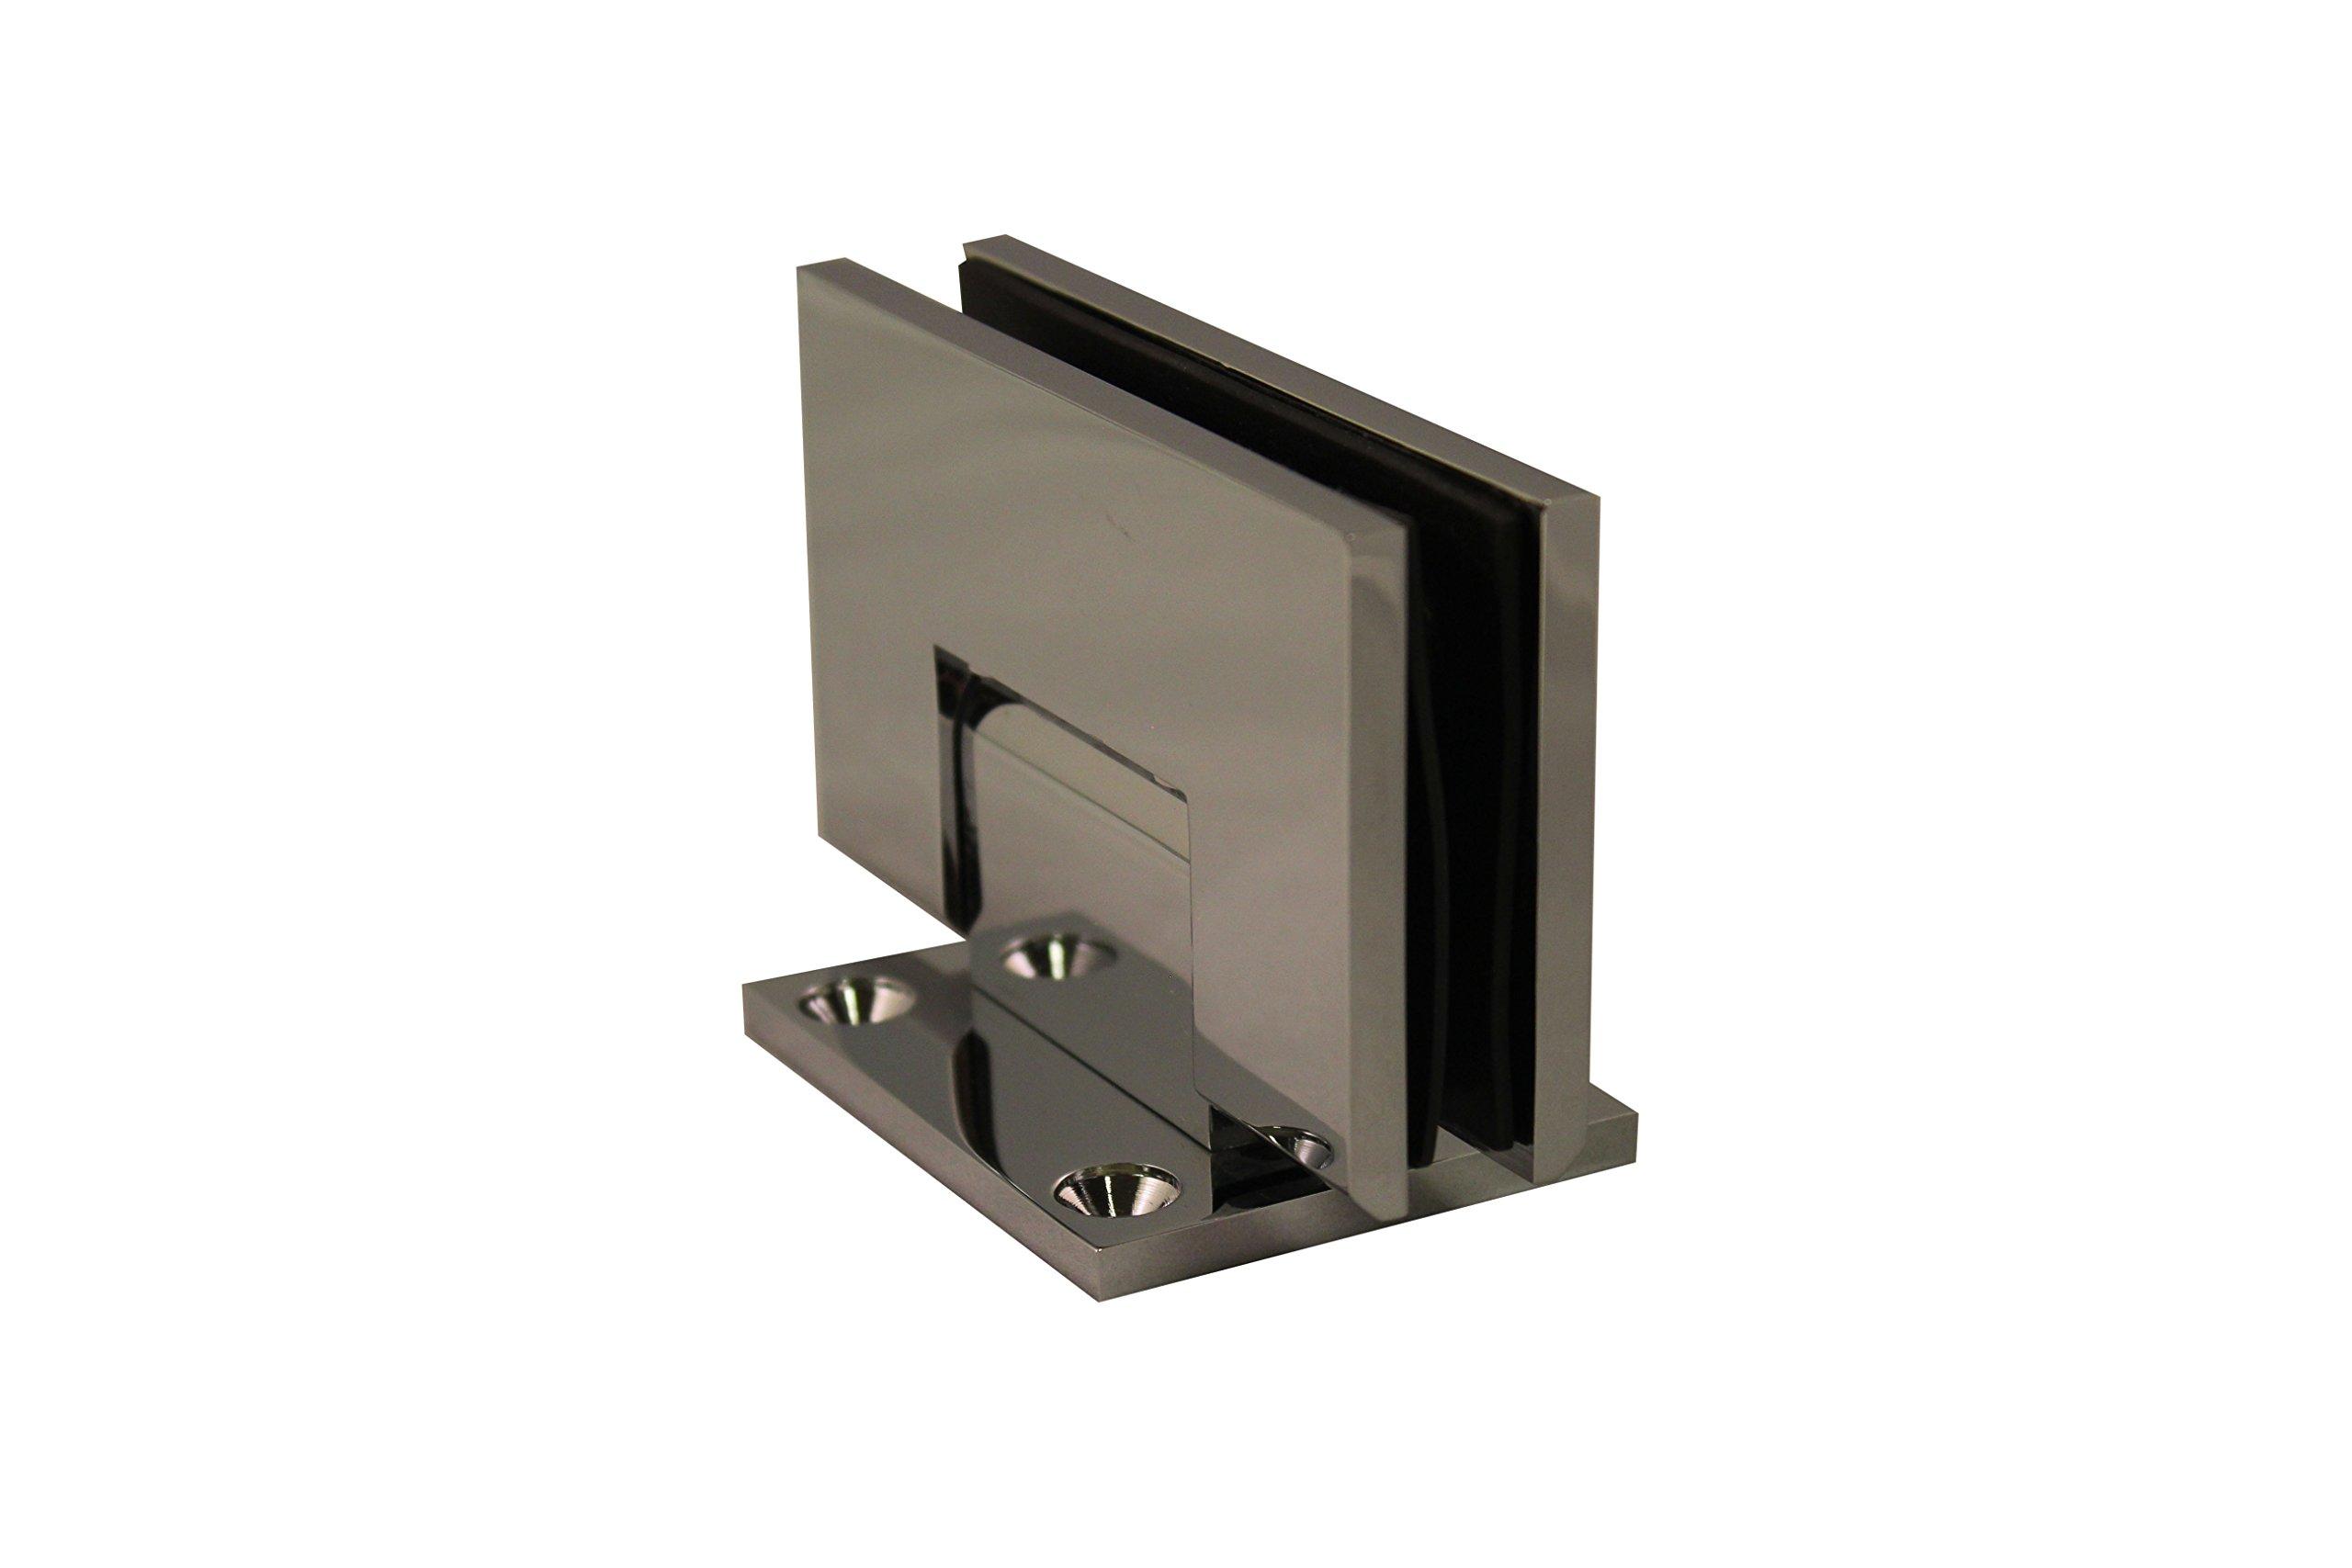 WBS 'Atlantic' Heavy Duty / Heavy Glass Shower Door Hinge Pair (Chrome) by Wardrobe and Bath Specialties